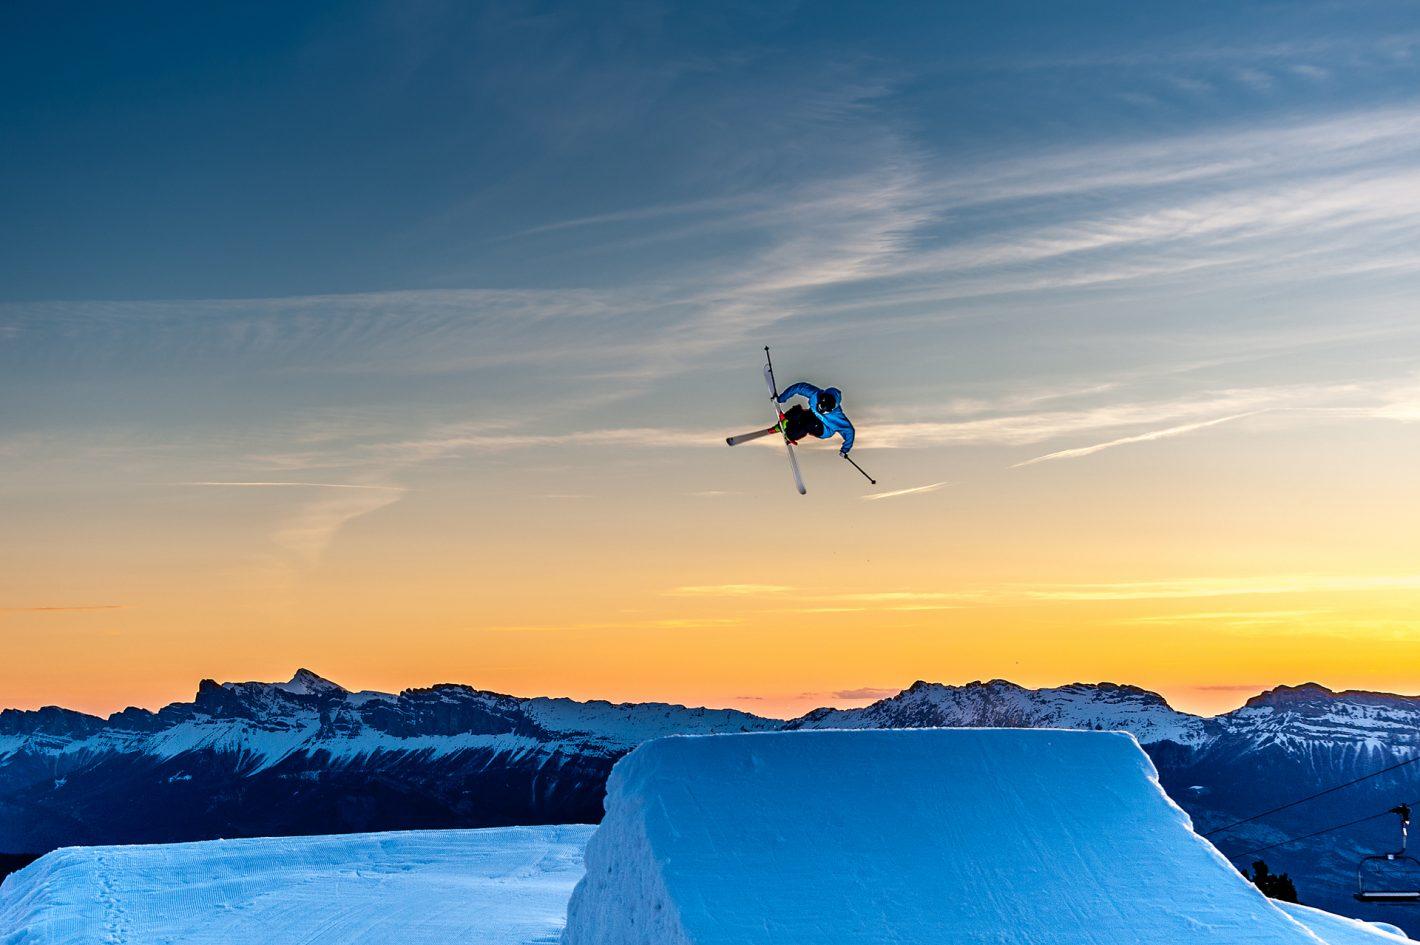 Nikon Sports Ski Kevin Roland Vincent Tim